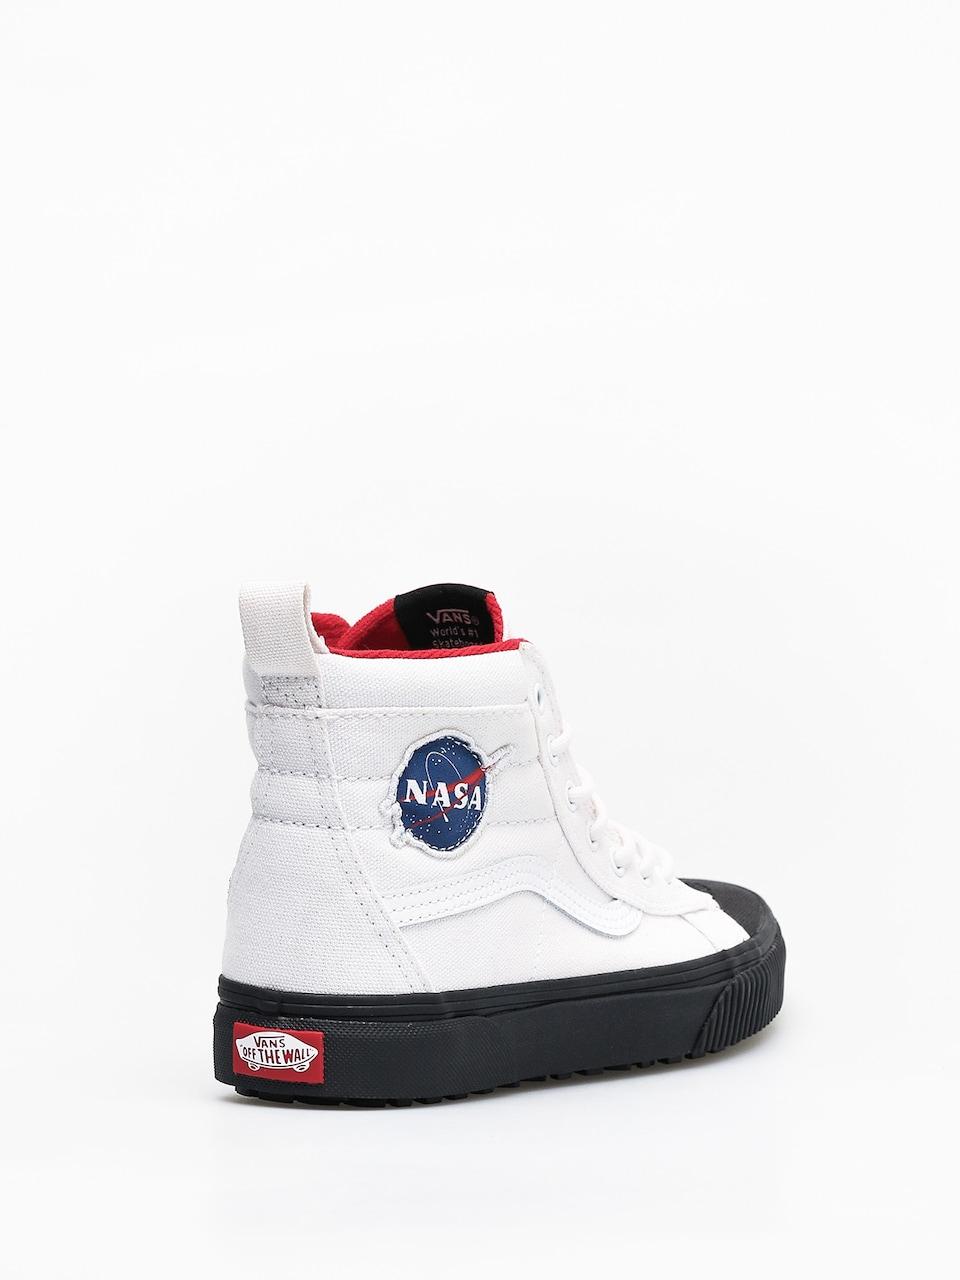 Buty Vans x NASA Sk8 Hi Mte Space Voyager (nasatrue white